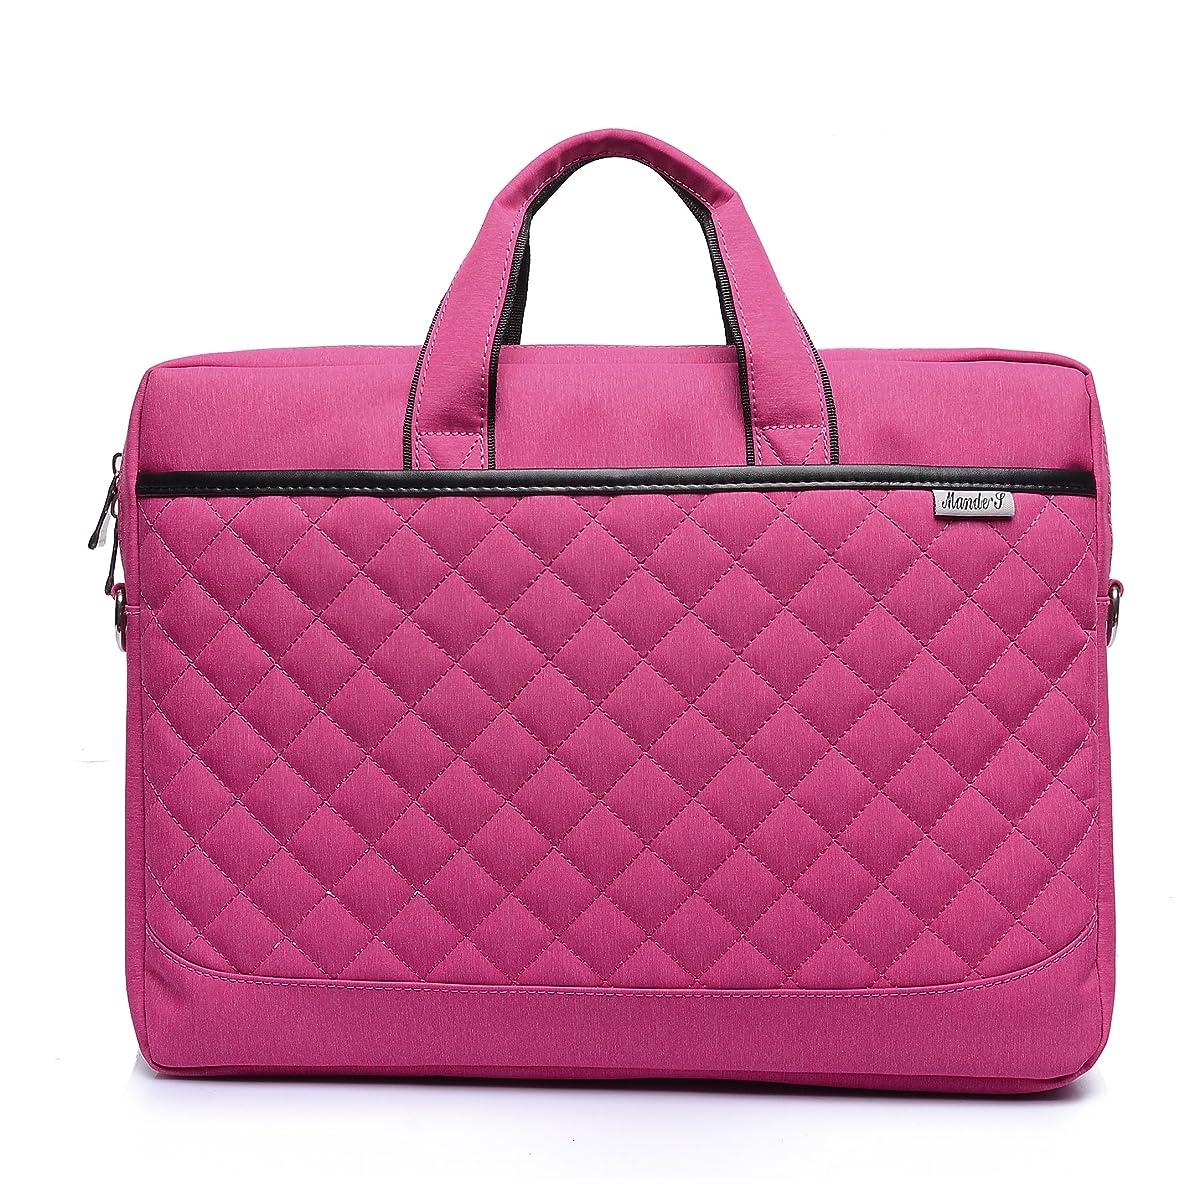 ZYSTERT 15.6-Inch Laptop Bag Shoulder Bag With Strap Multi-Compartment Messenger Hand Bag Briefcase for Laptop/iPad Pro/Tablet/Macbook/Ultrabook/Men/Women (Pink)